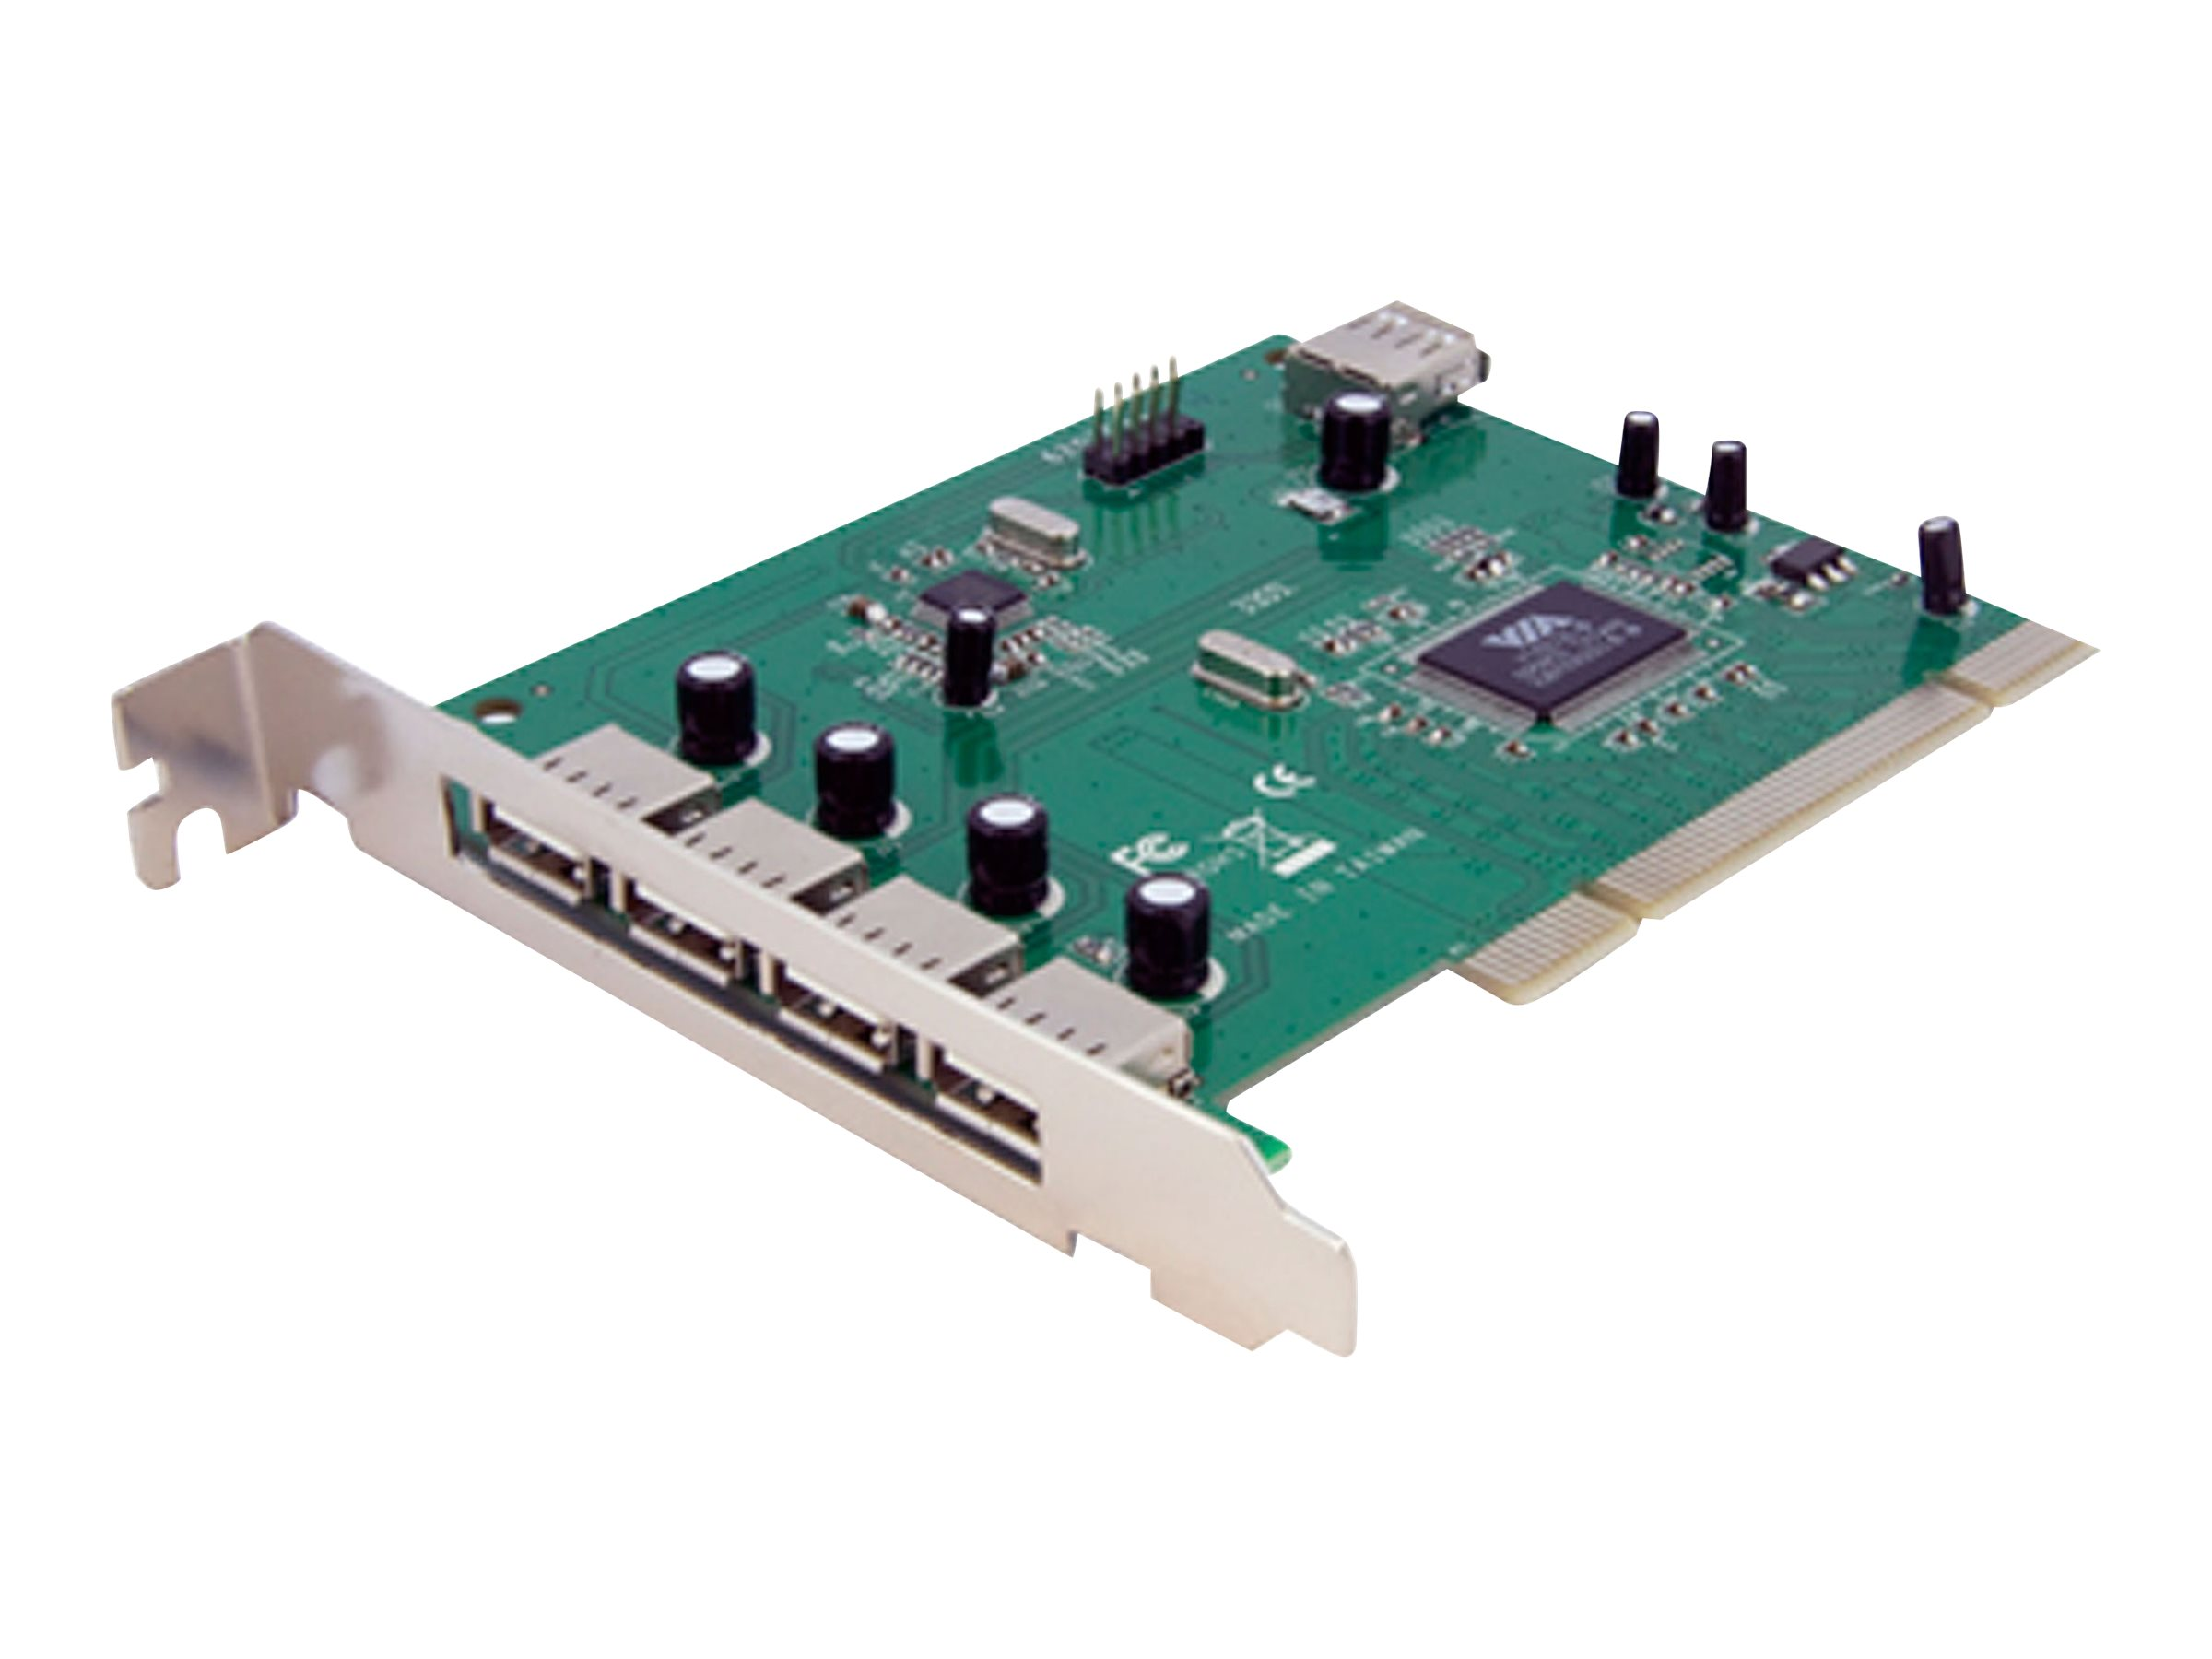 StarTech.com 7 Port USB 2.0 PCI Schnittstellenkarte - USB Controller Adapter Karte - USB-Adapter - PCI - USB, USB 2.0 - 7 Anschl